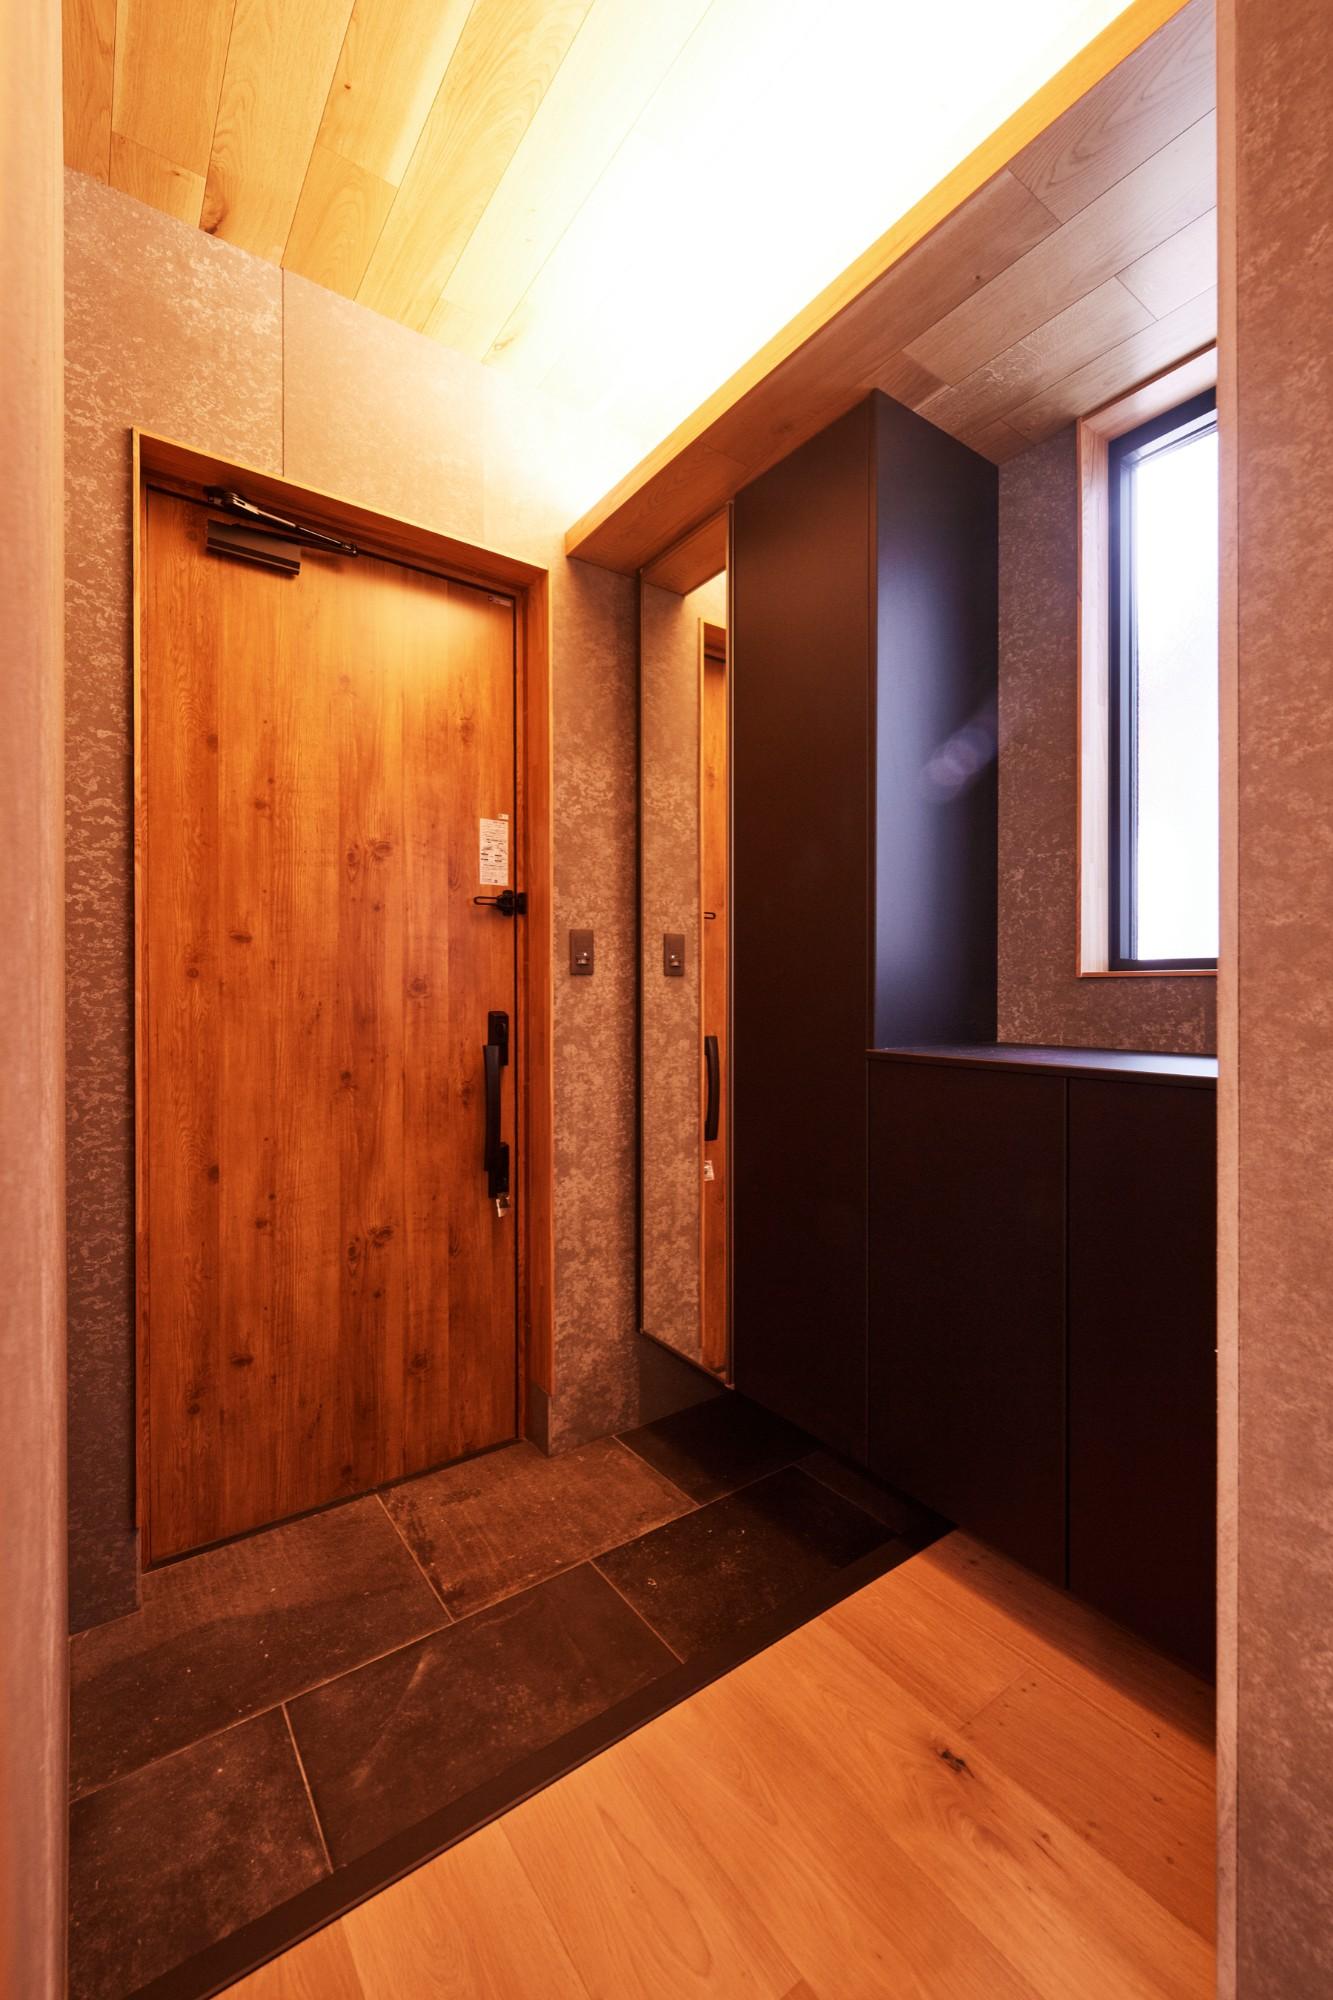 DETAIL HOME(ディテールホーム)「コンパクトにデザインする家」のシンプル・ナチュラルな玄関の実例写真